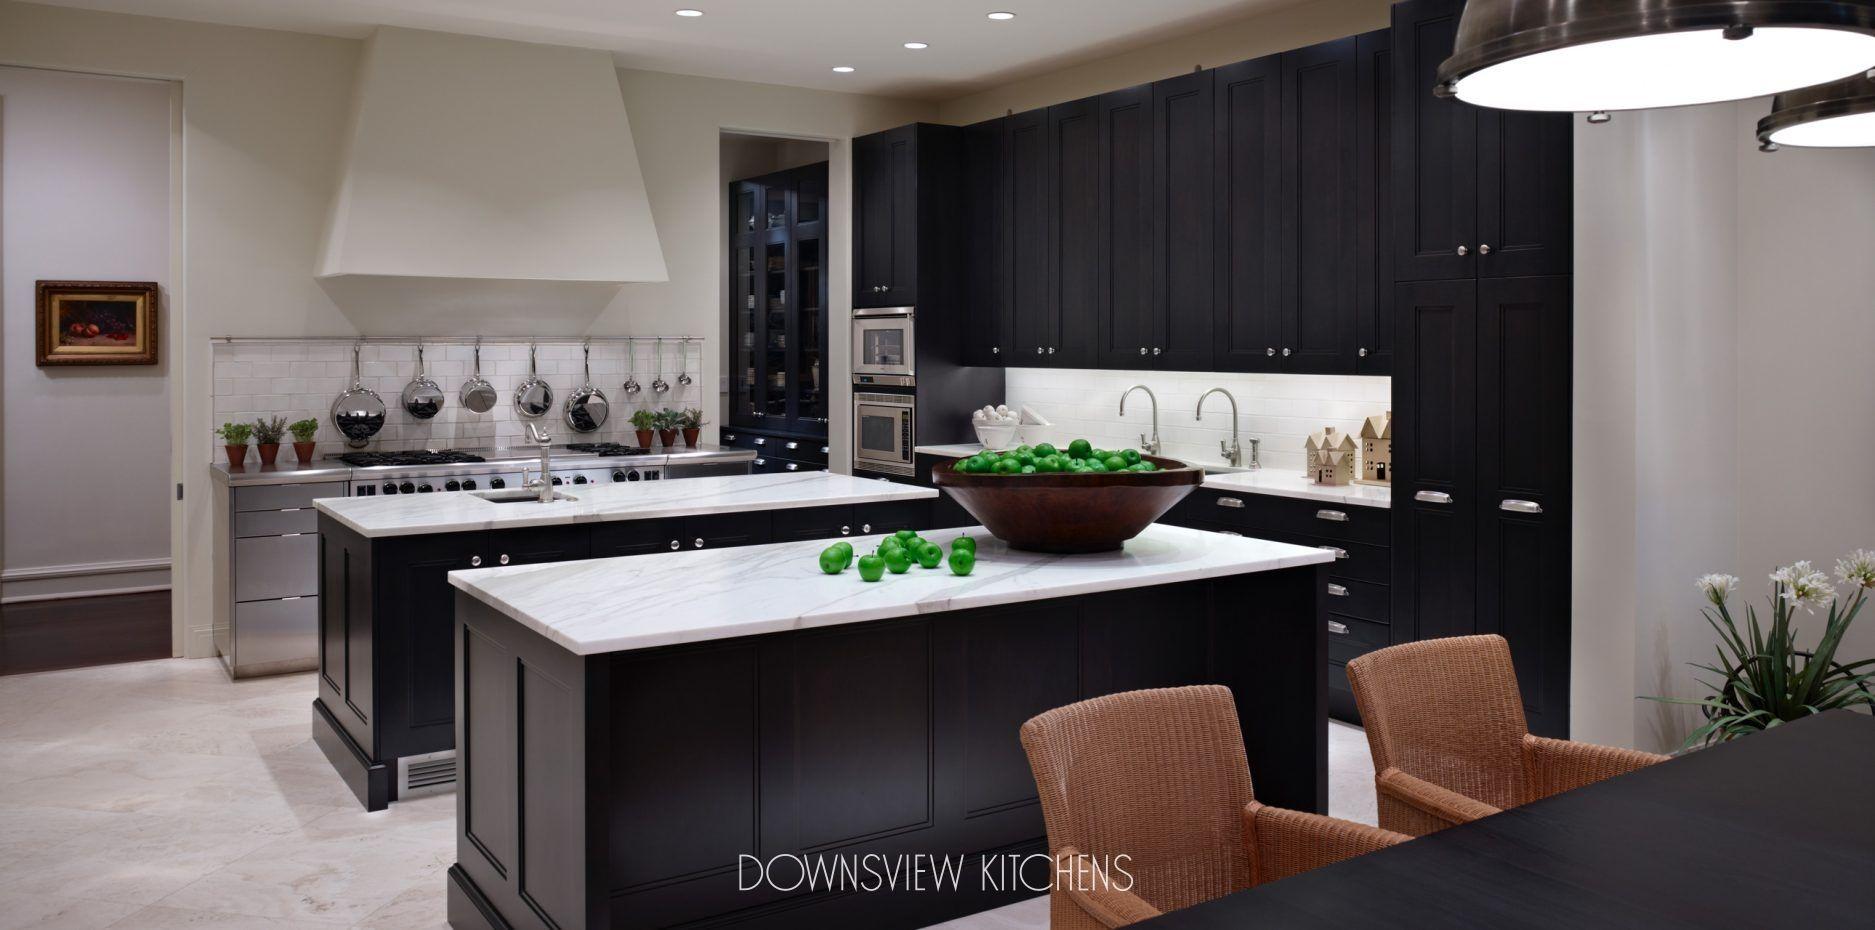 Best Modern Makeover Downsview Kitchens And Fine Custom 400 x 300